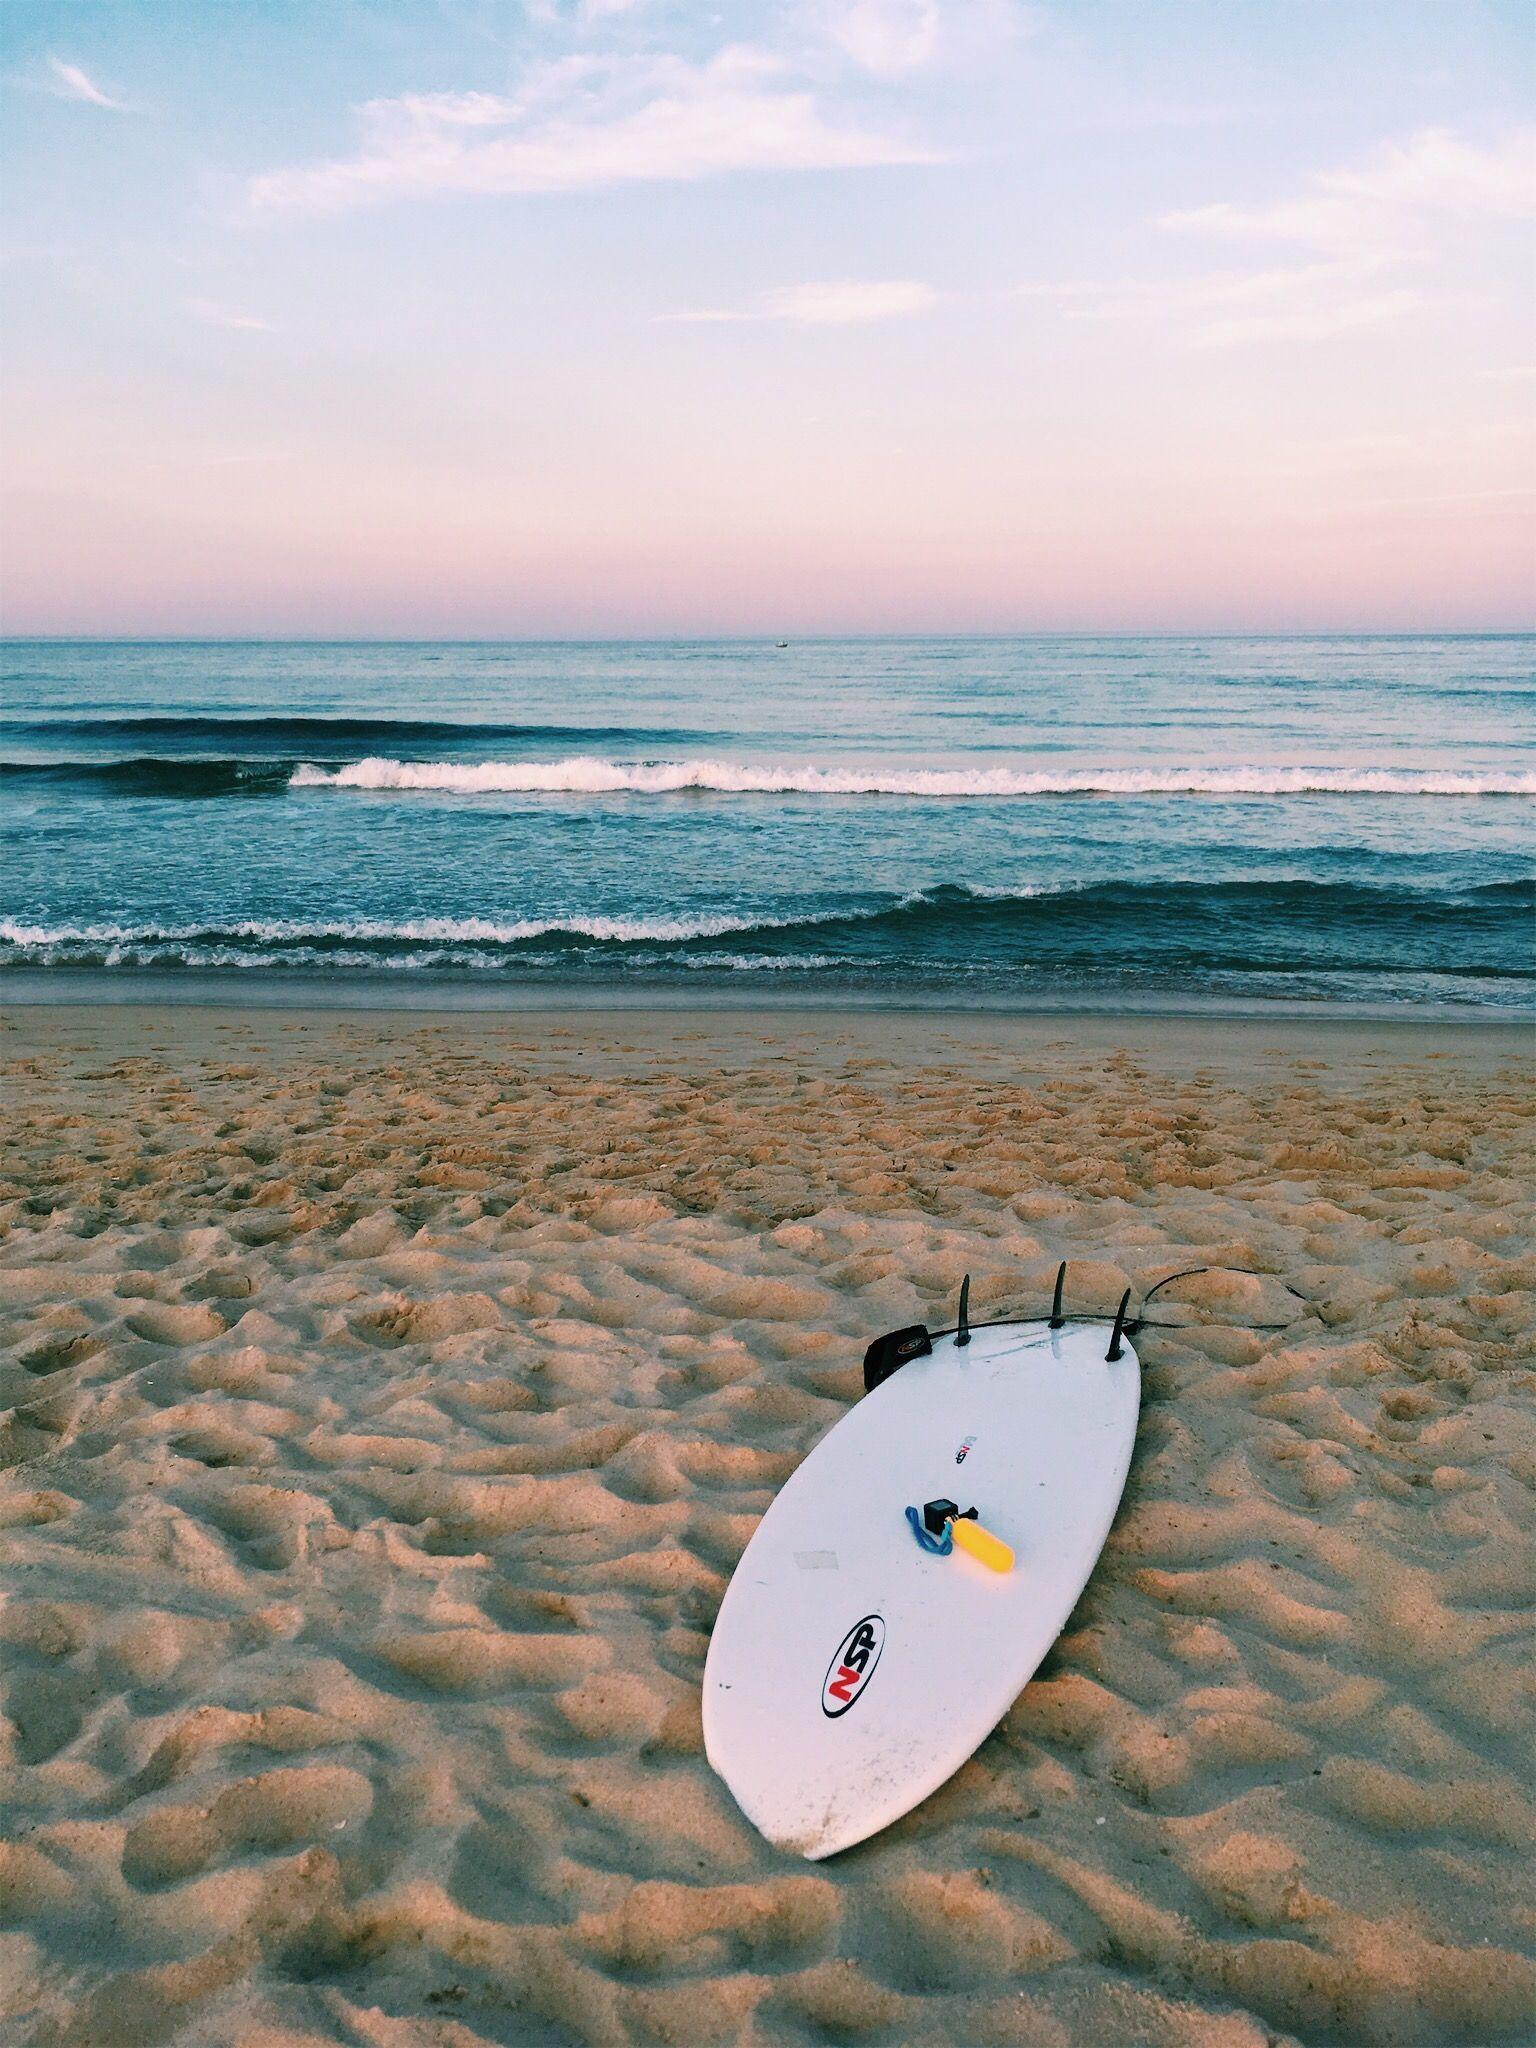 Aesthetic Beach Wallpaper Hd